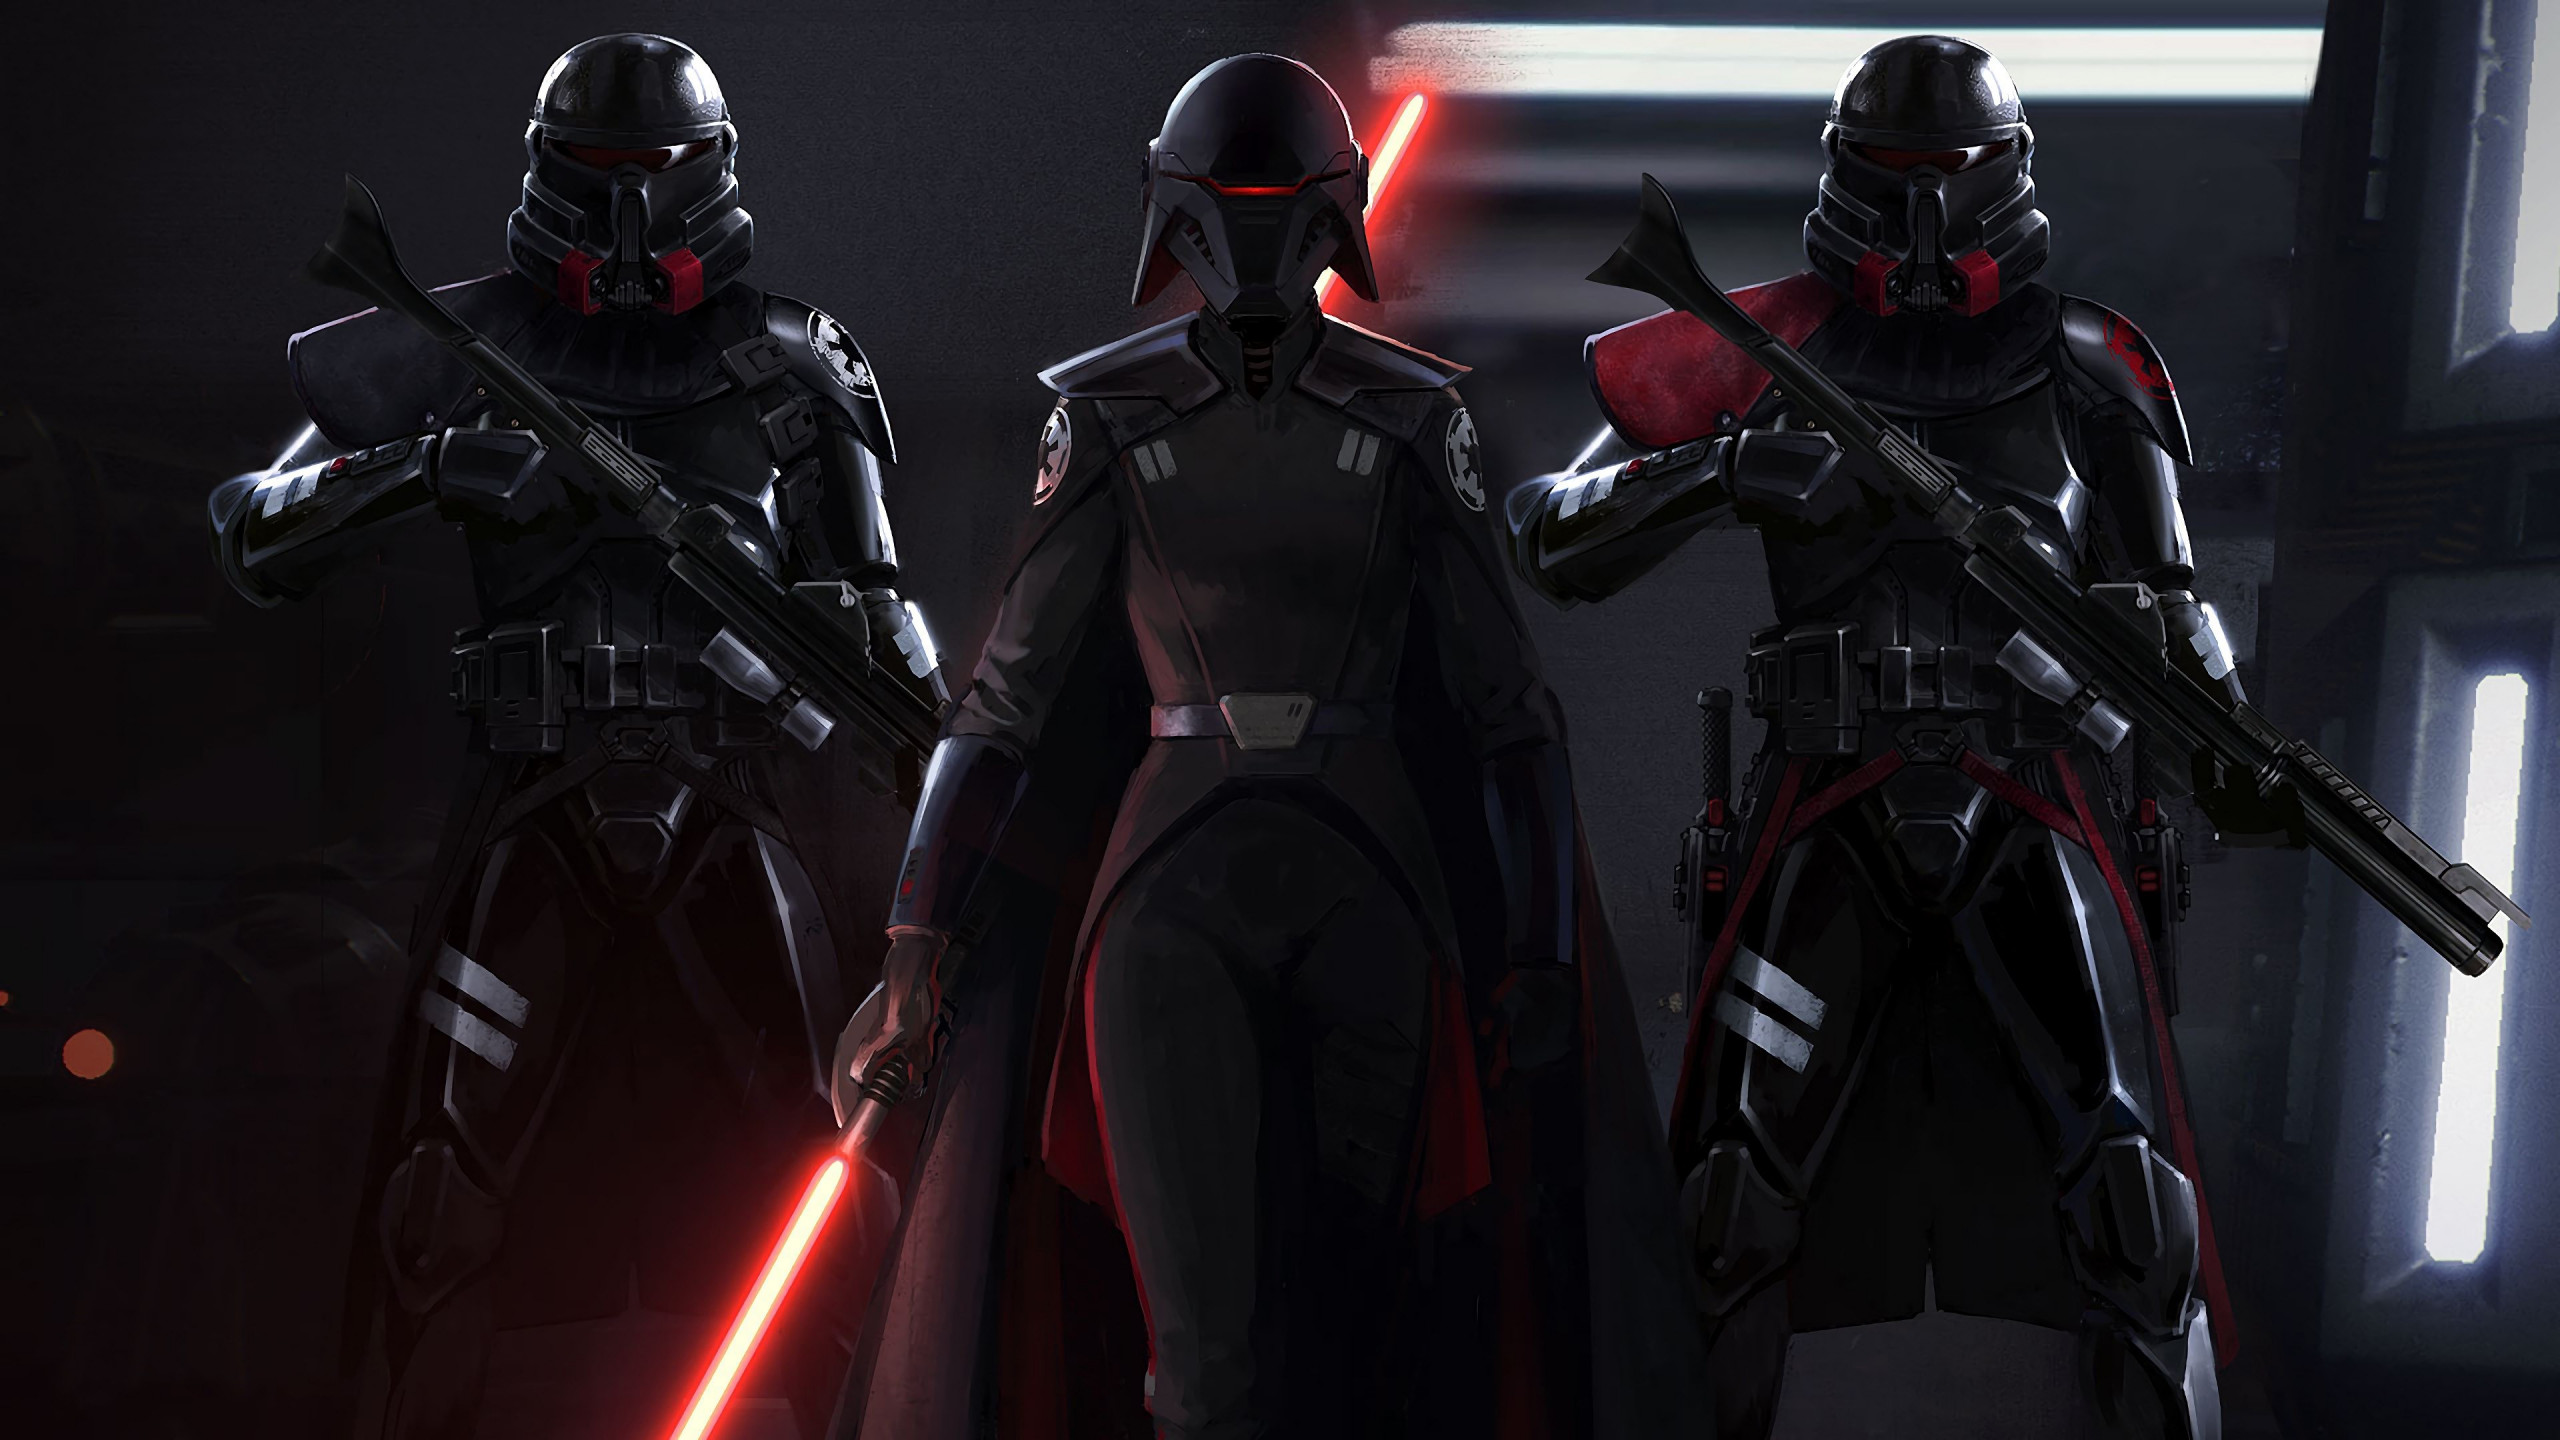 Download wallpaper: Star Wars Jedi: Fallen Order 2019 ...